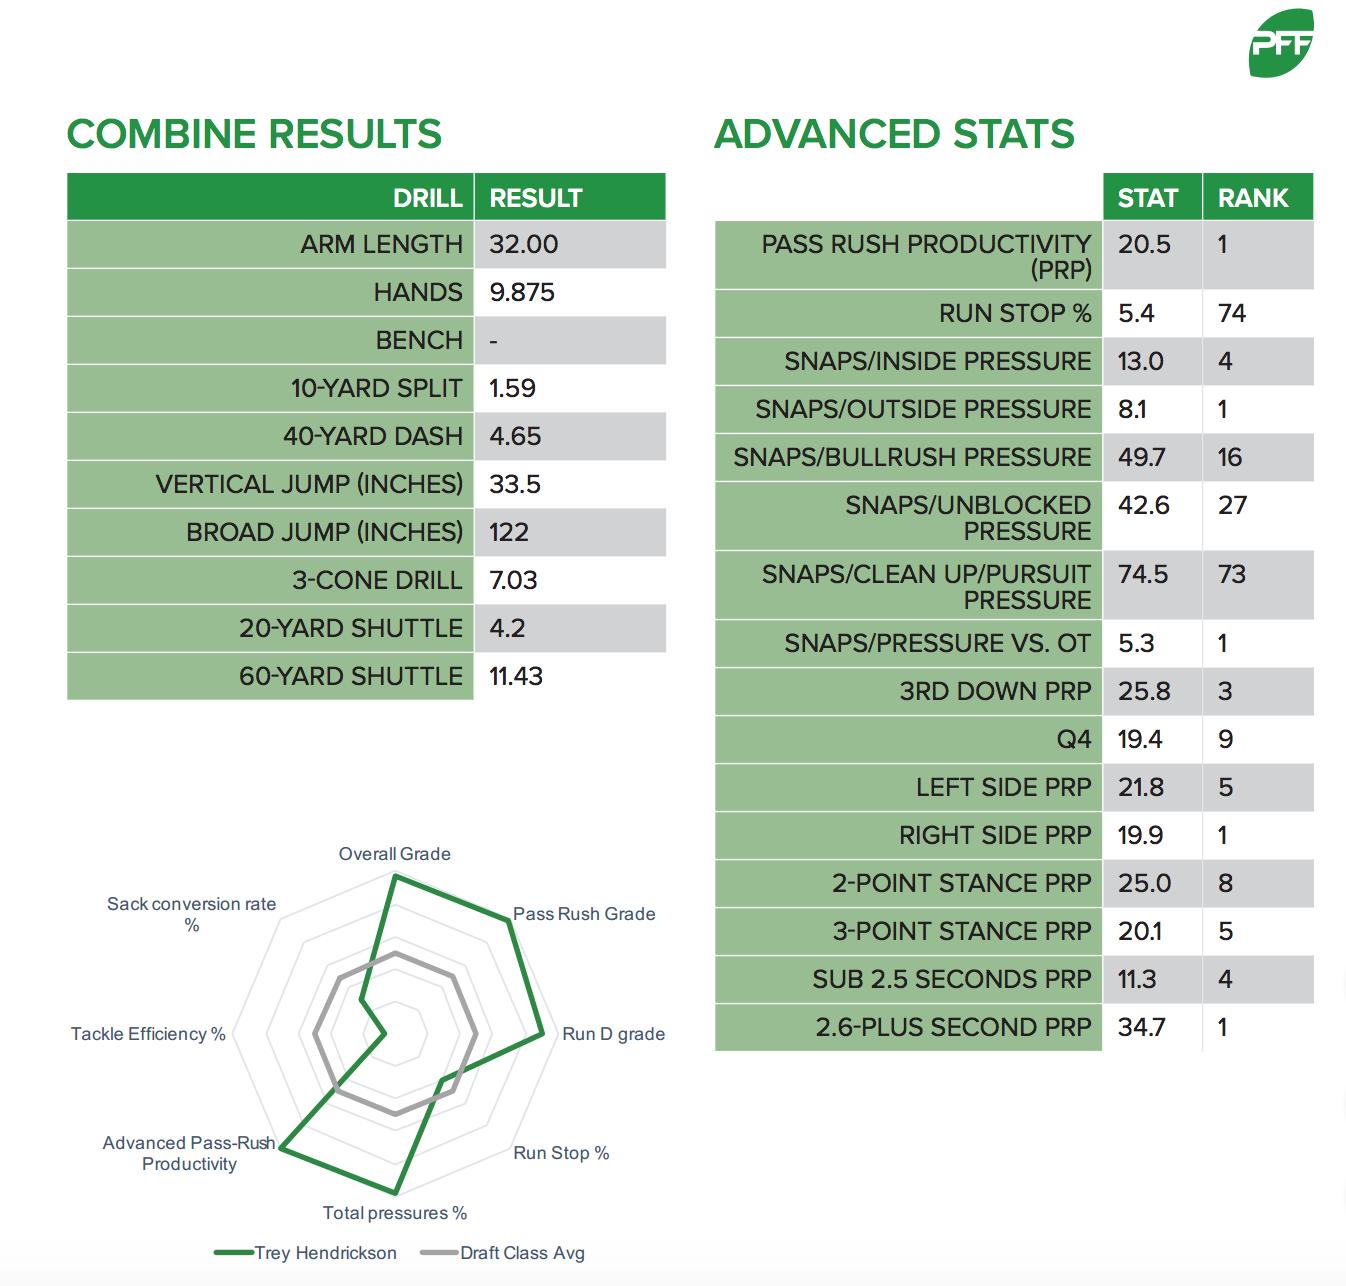 Trey Hendrickson Advanced Stats